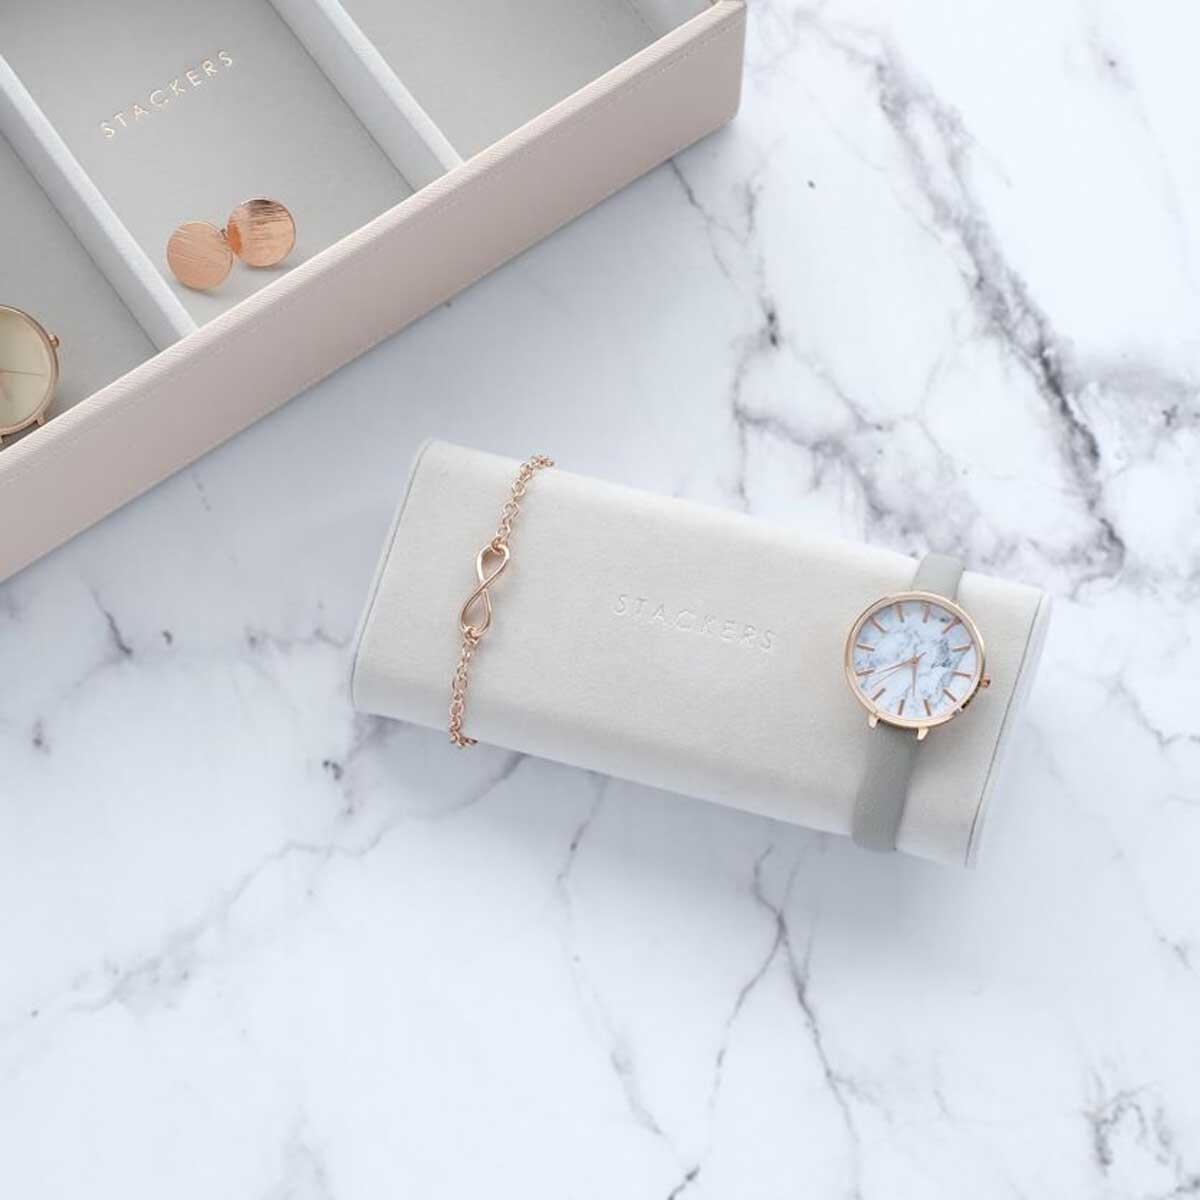 Sieraden-/horlogedoos Grey horloge/armbandhouder